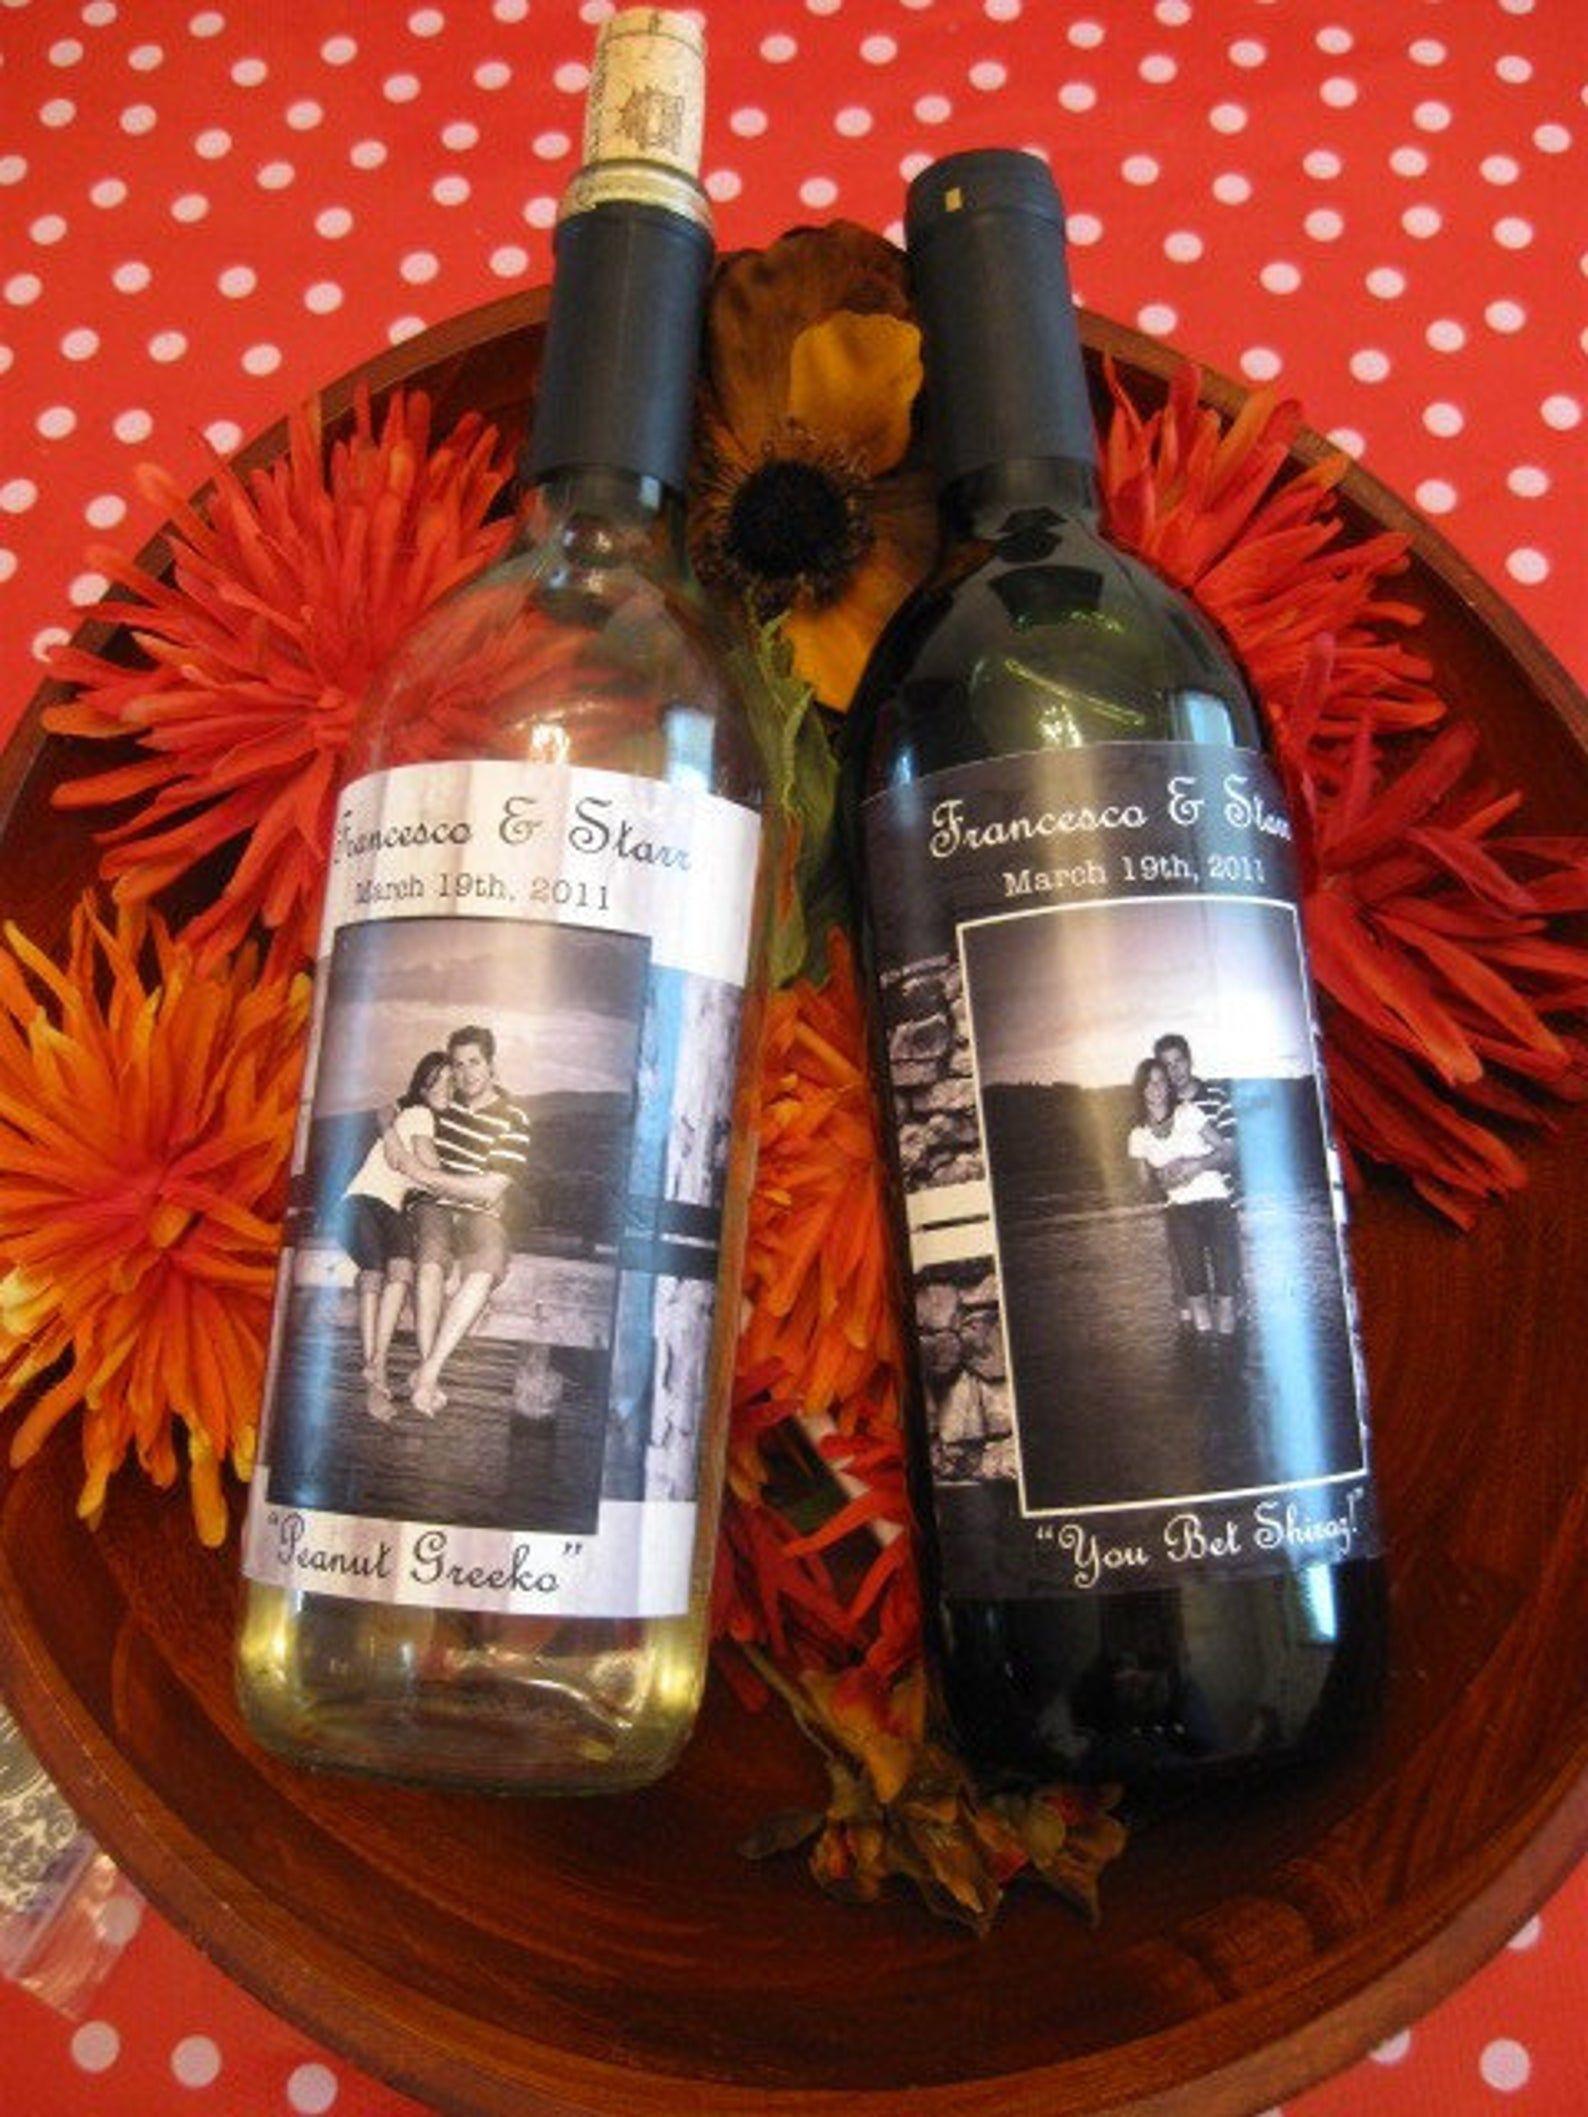 Wine Bottle Labels Custom Design And Printing With Etsy In 2020 Wine Bottle Labels Wine Bottle Wine Bottle Labels Wedding